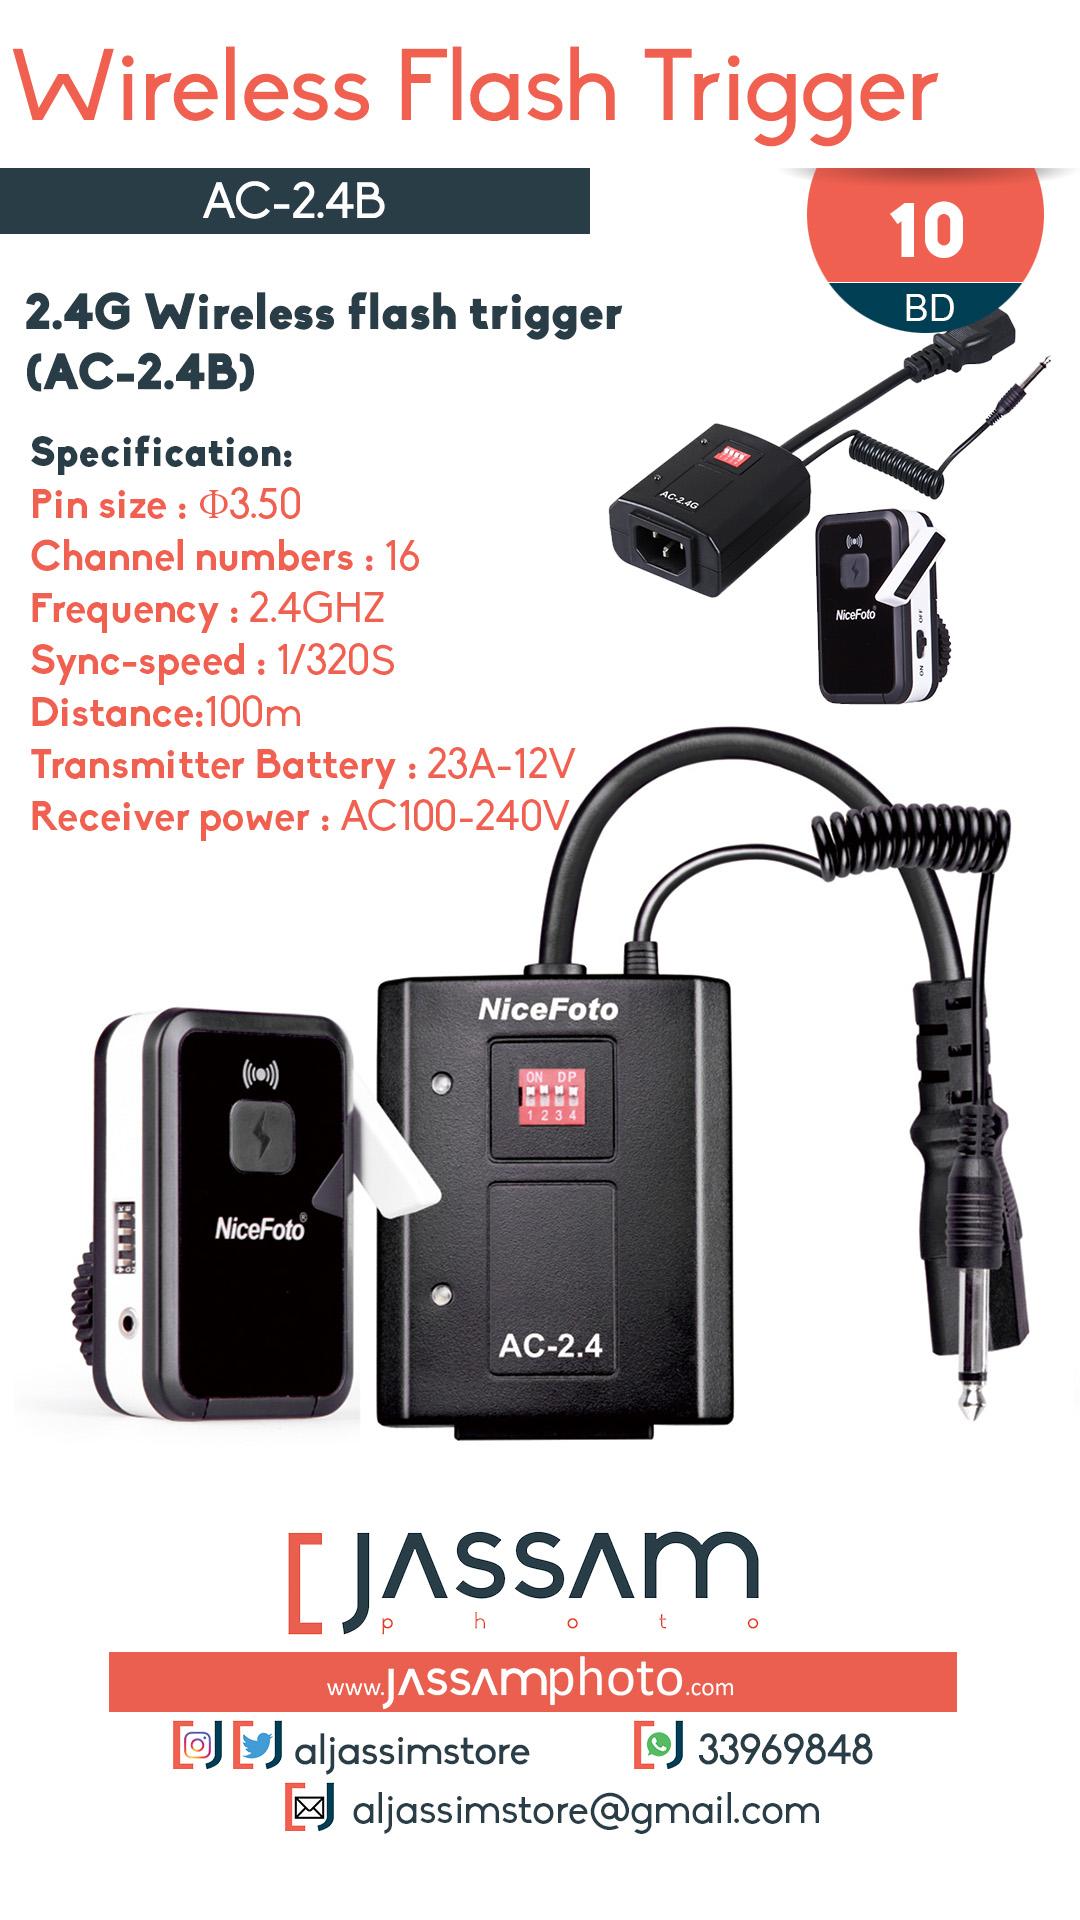 Flash Trigger AC-2.4B